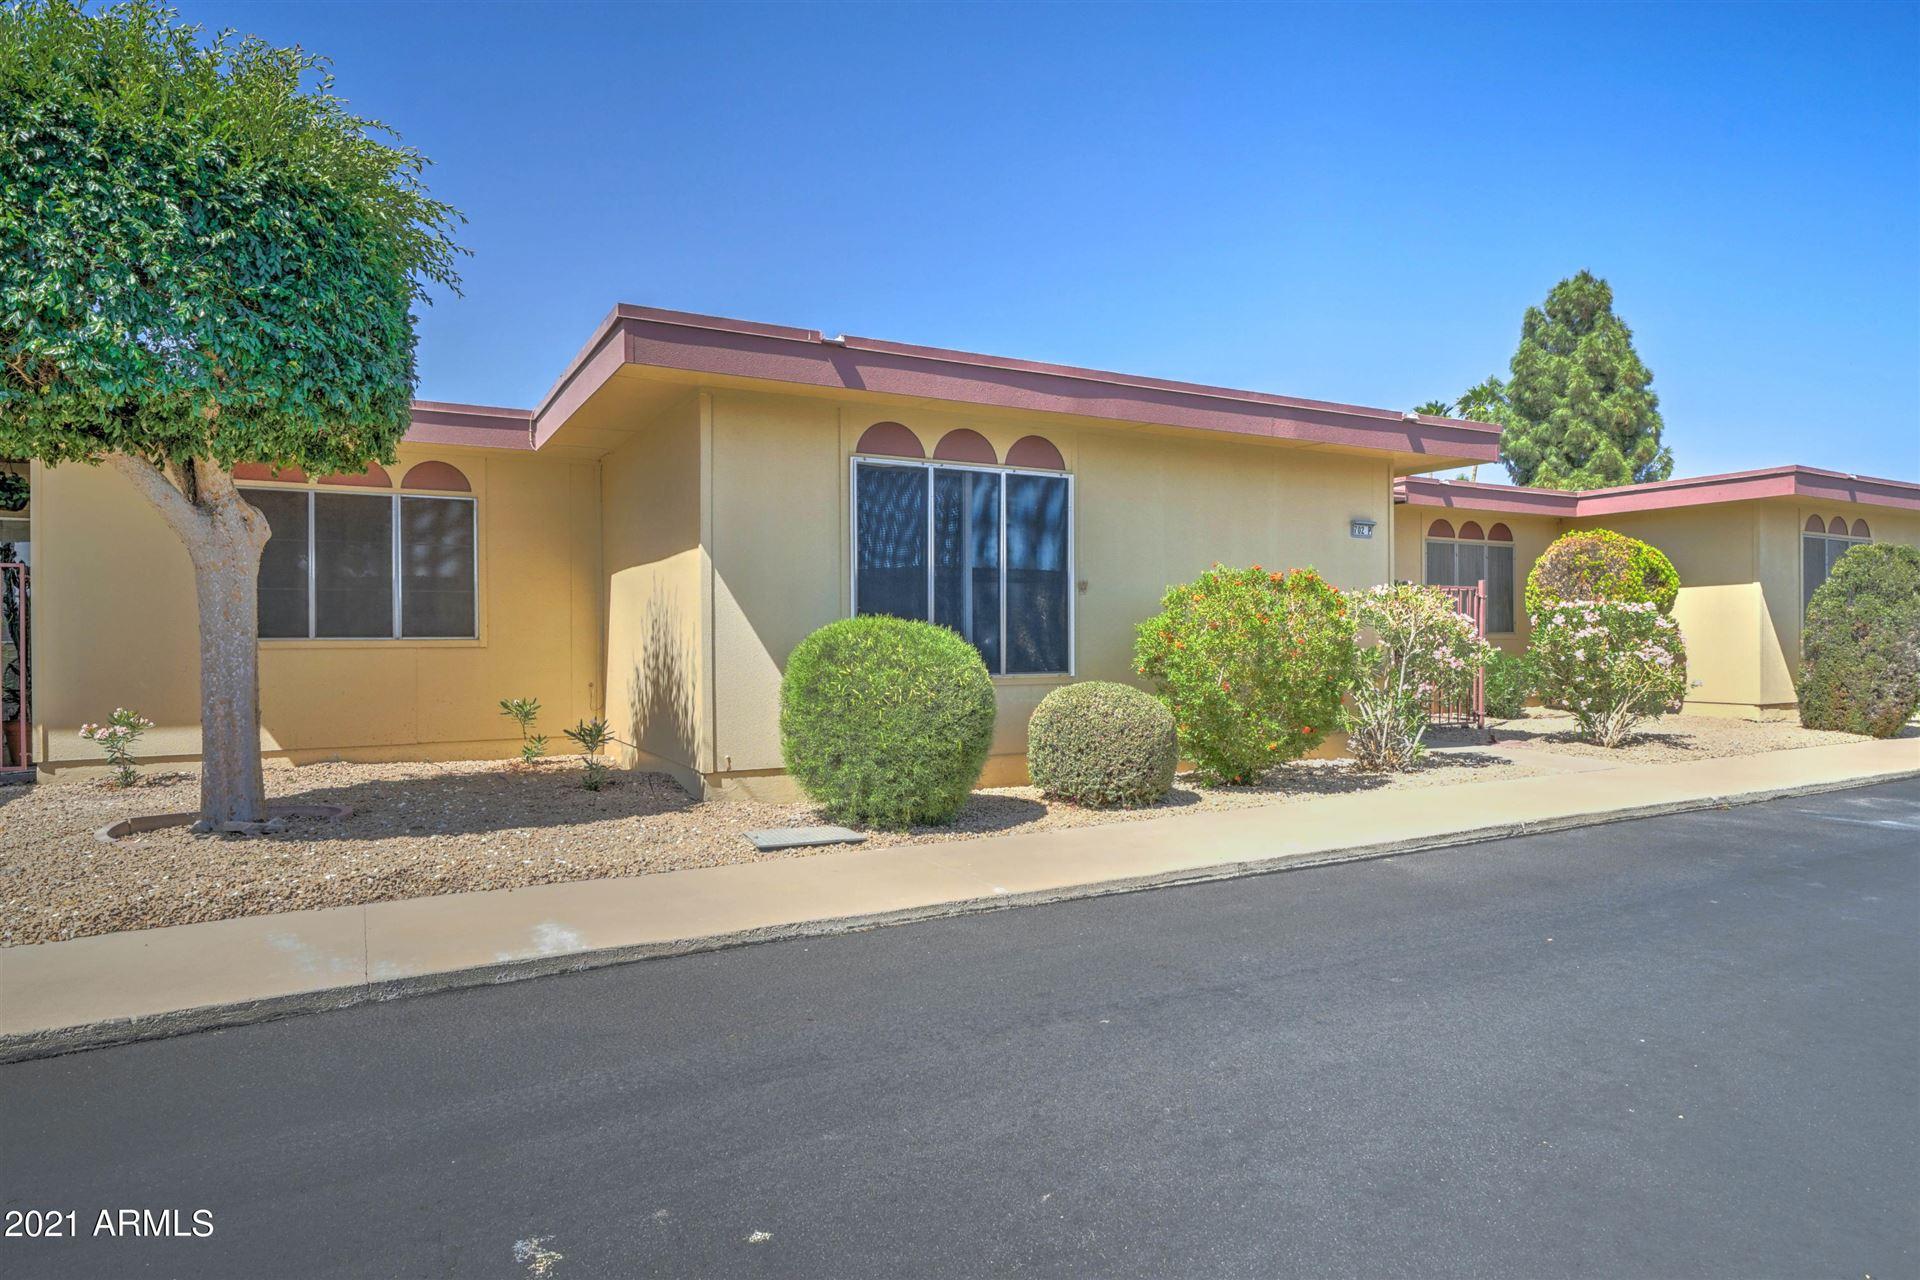 Photo of 13702 N 98th Ave Avenue #P, Sun City, AZ 85351 (MLS # 6230146)